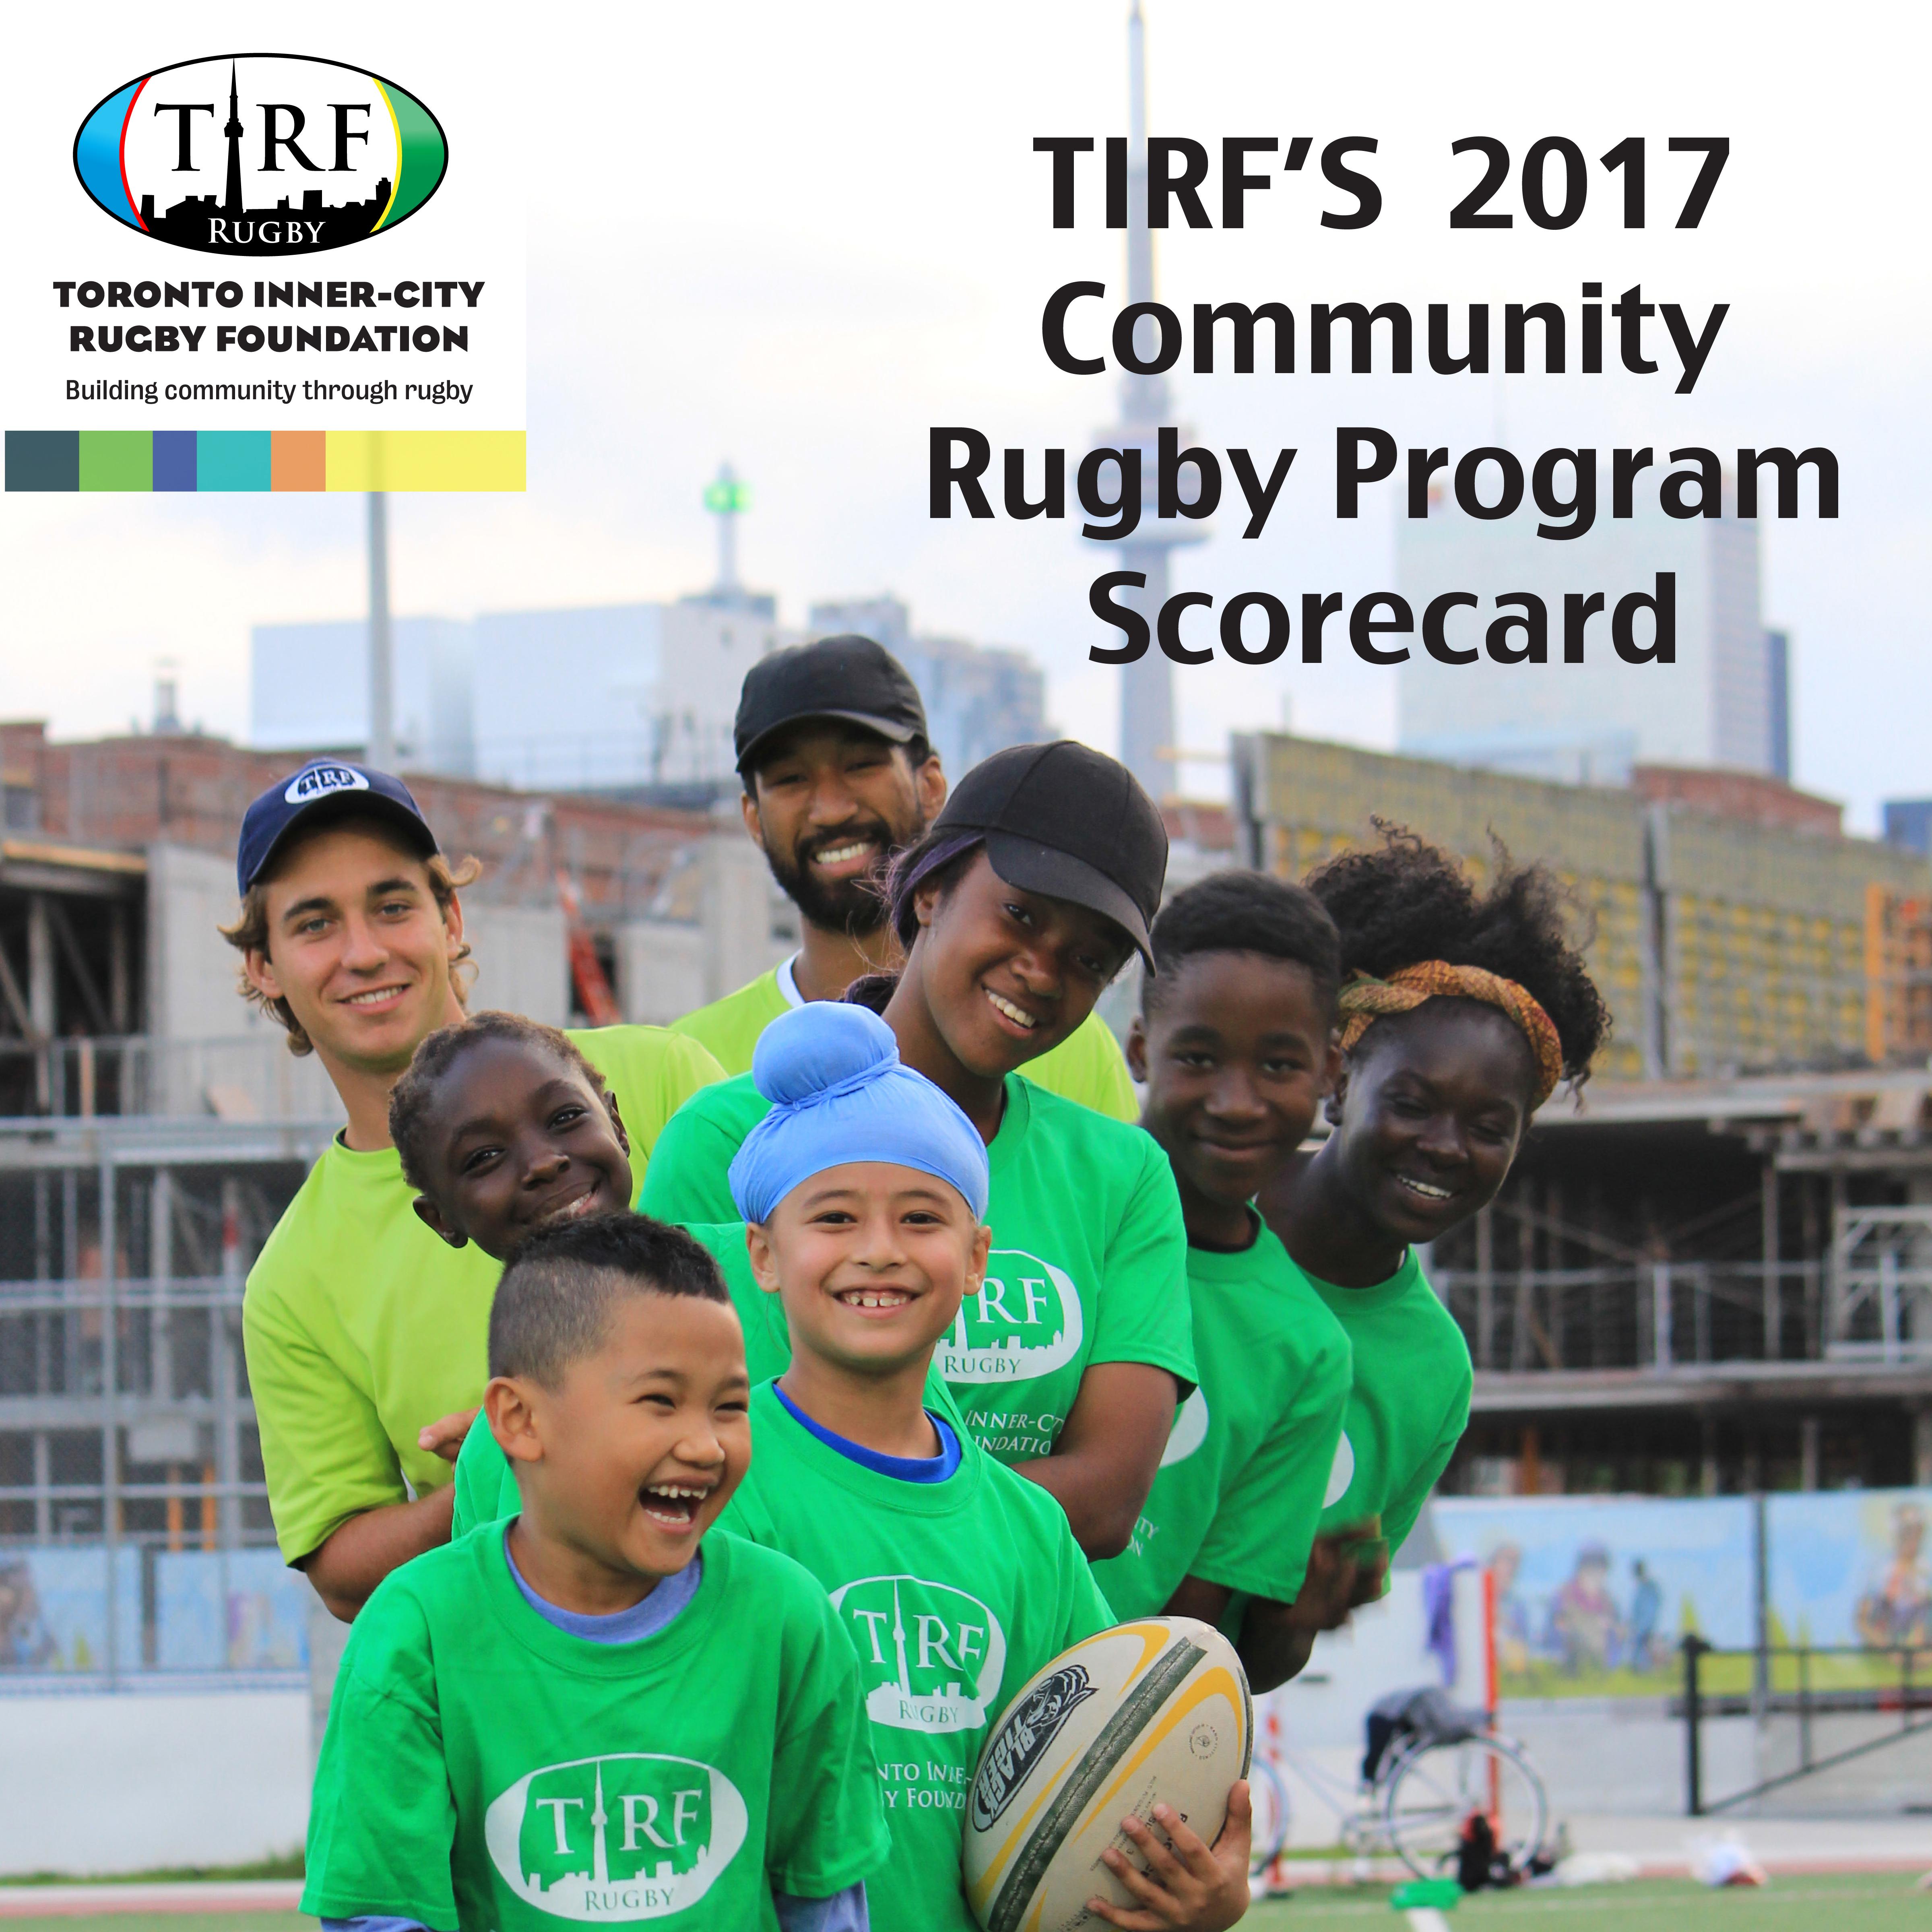 TIRF's 2017 Community Rugby Program Scorecard